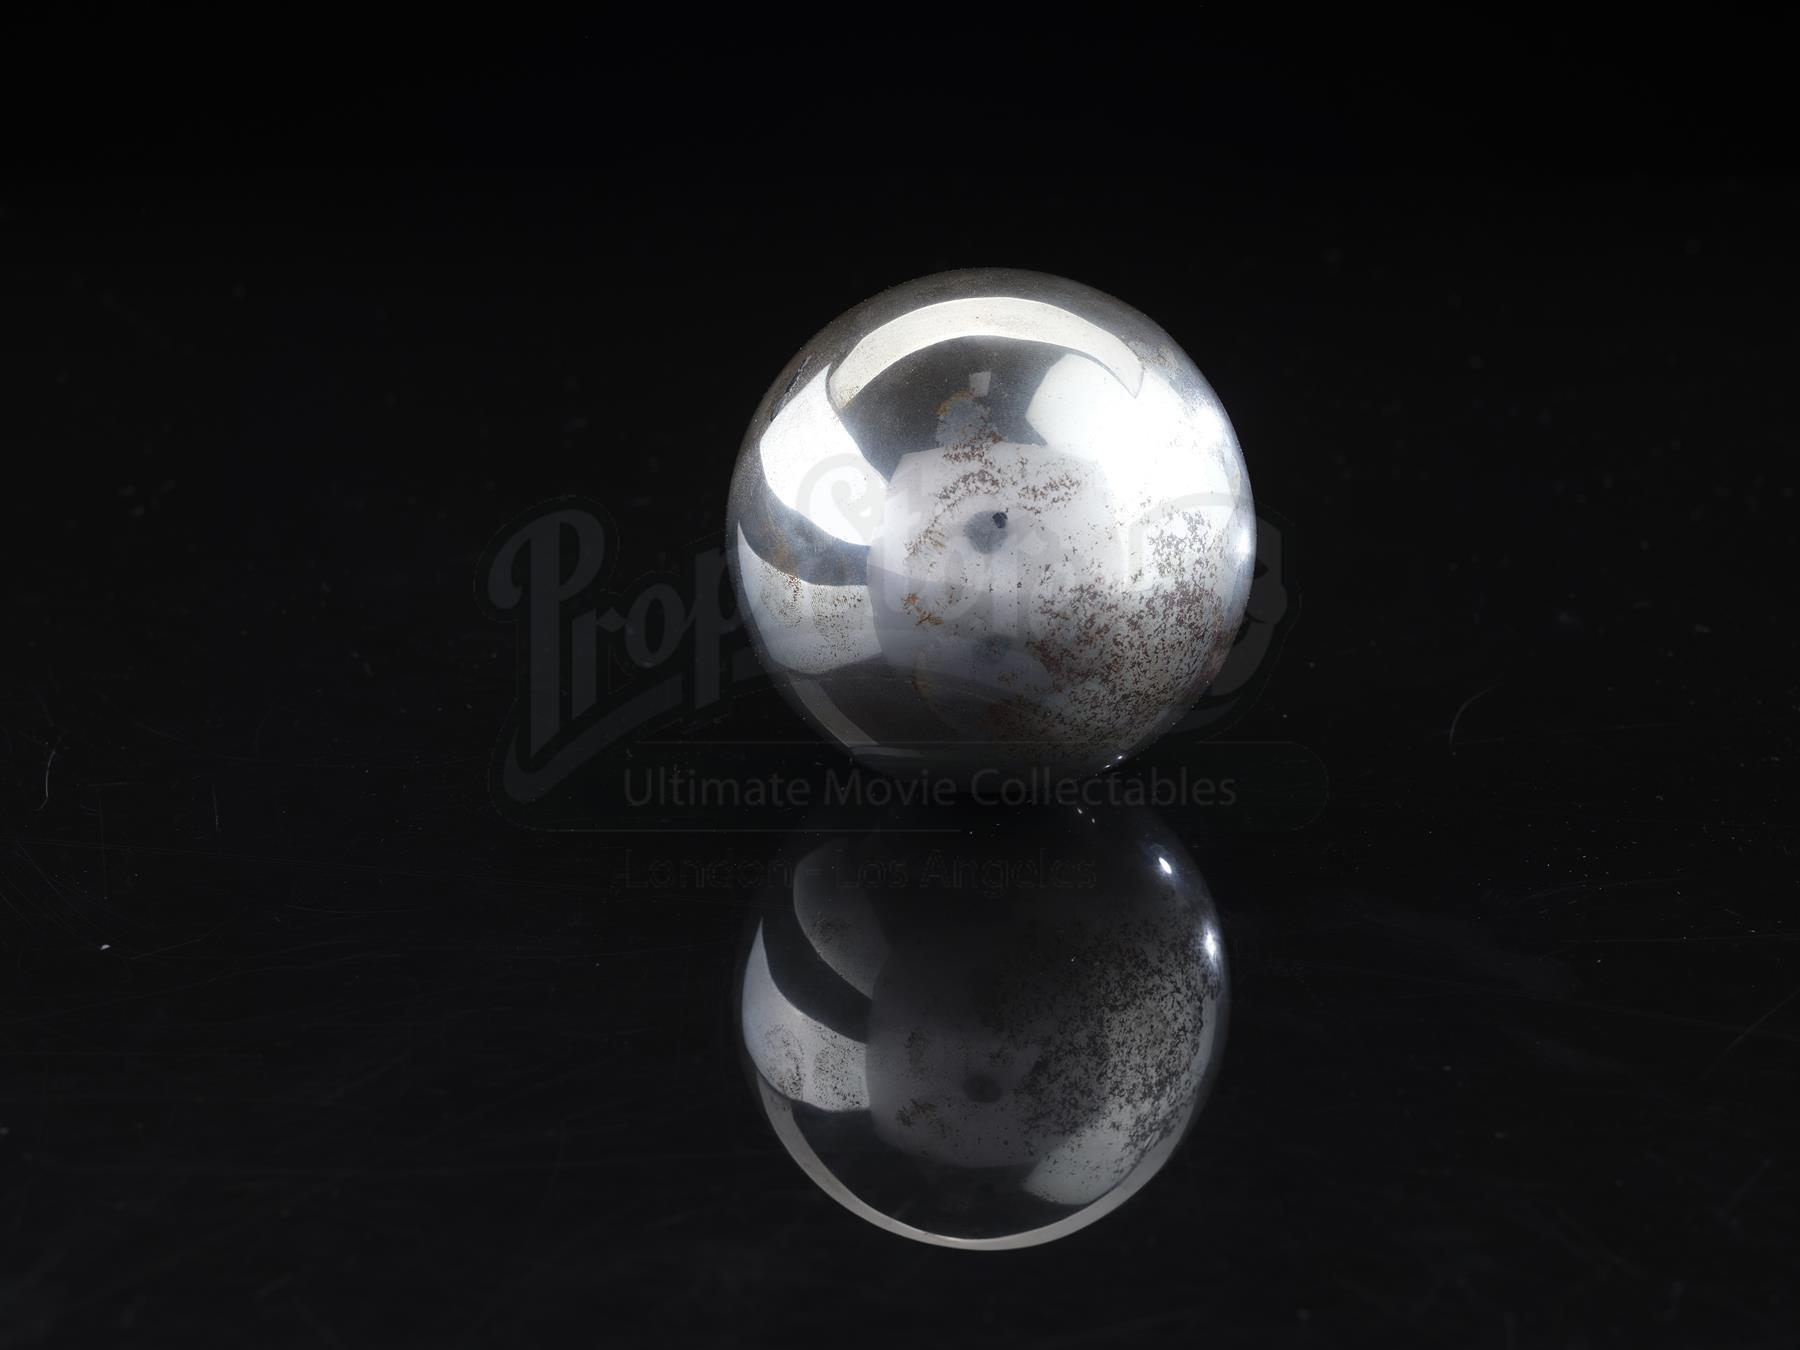 Rollerball_Ball-Real Prop (6).jpg